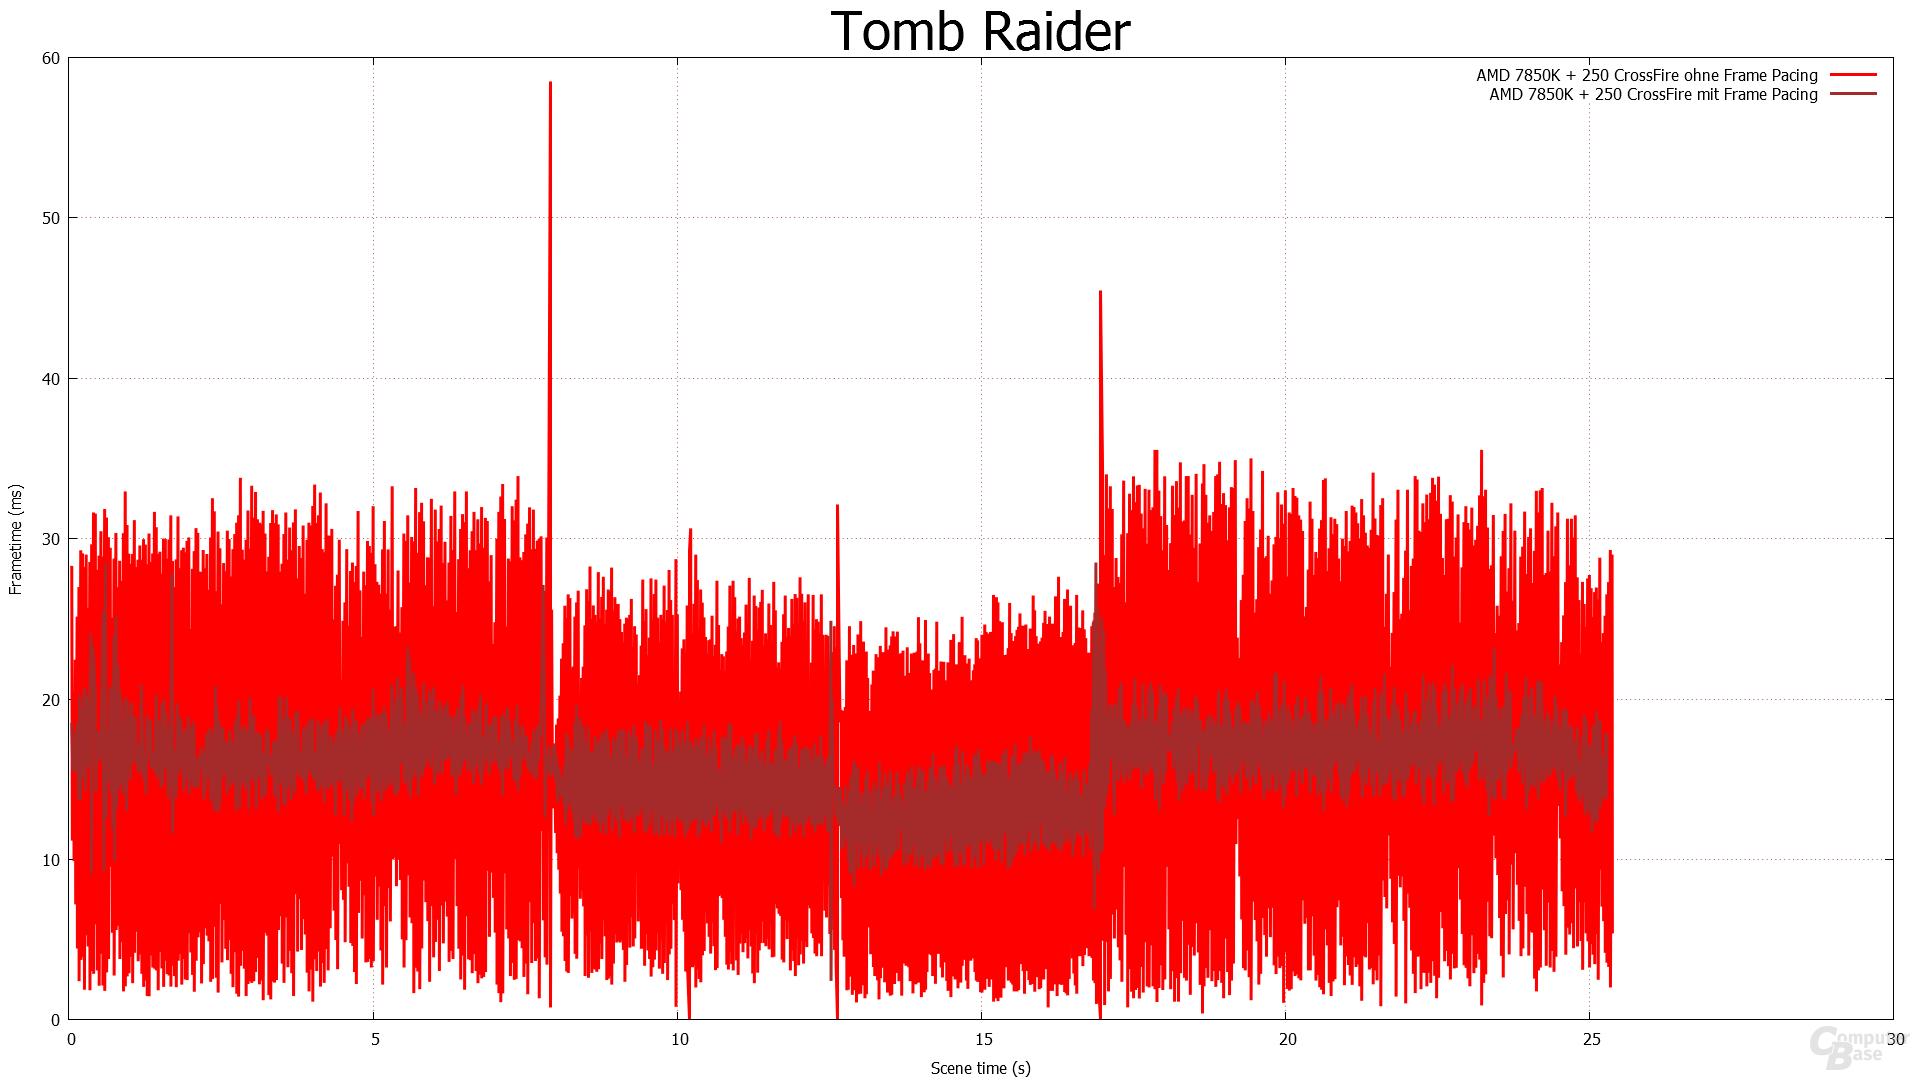 Frame Pacing - Tomb Raider